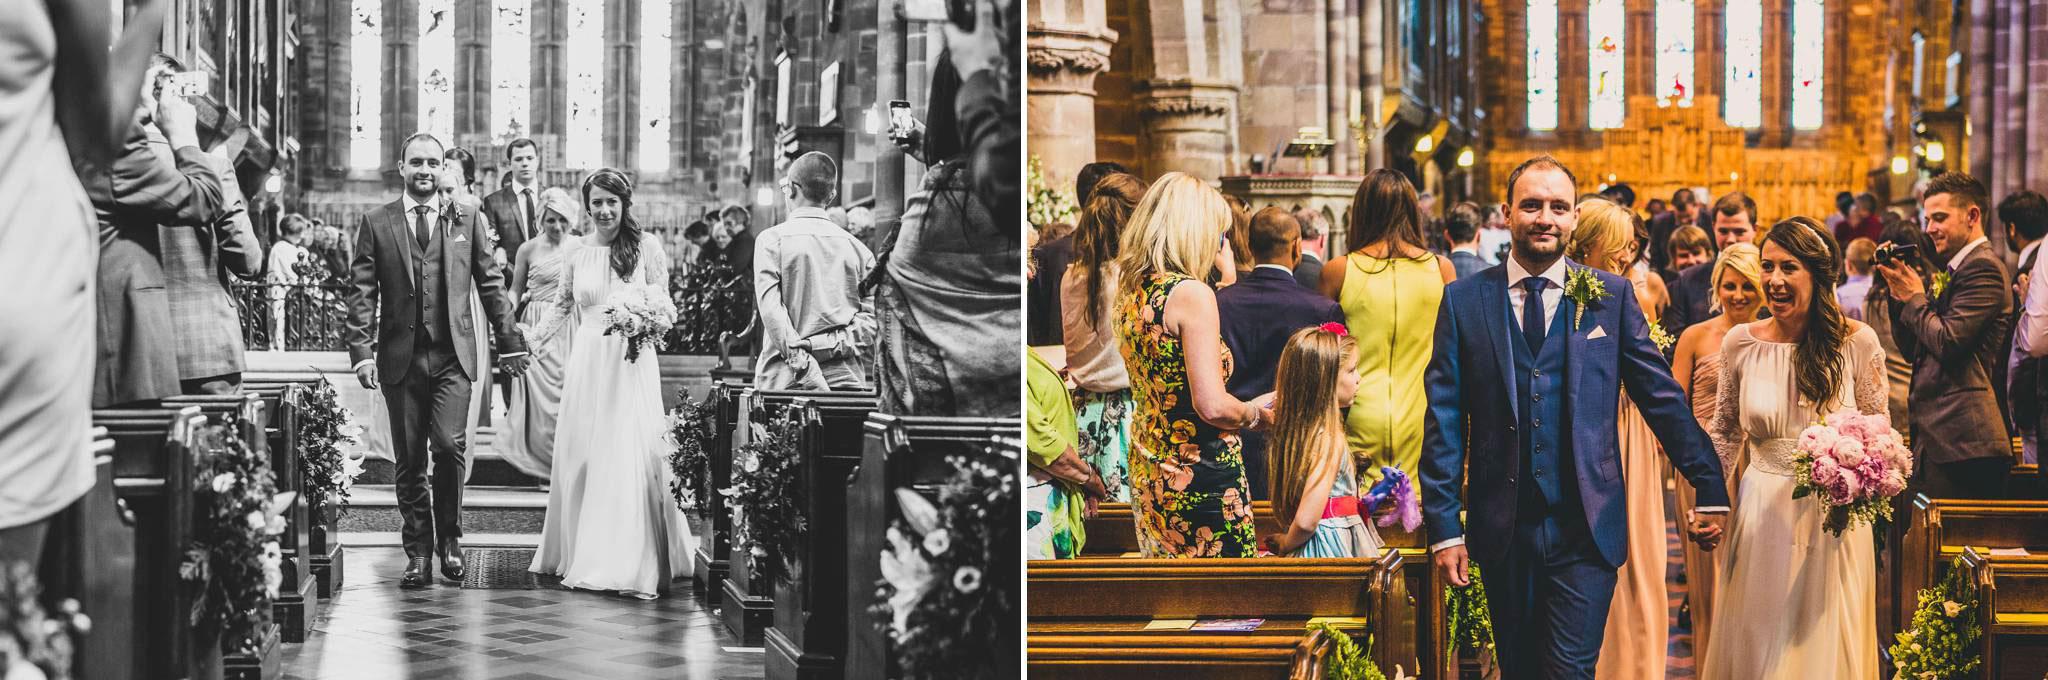 staffordshire-wedding-photographer-116.jpg